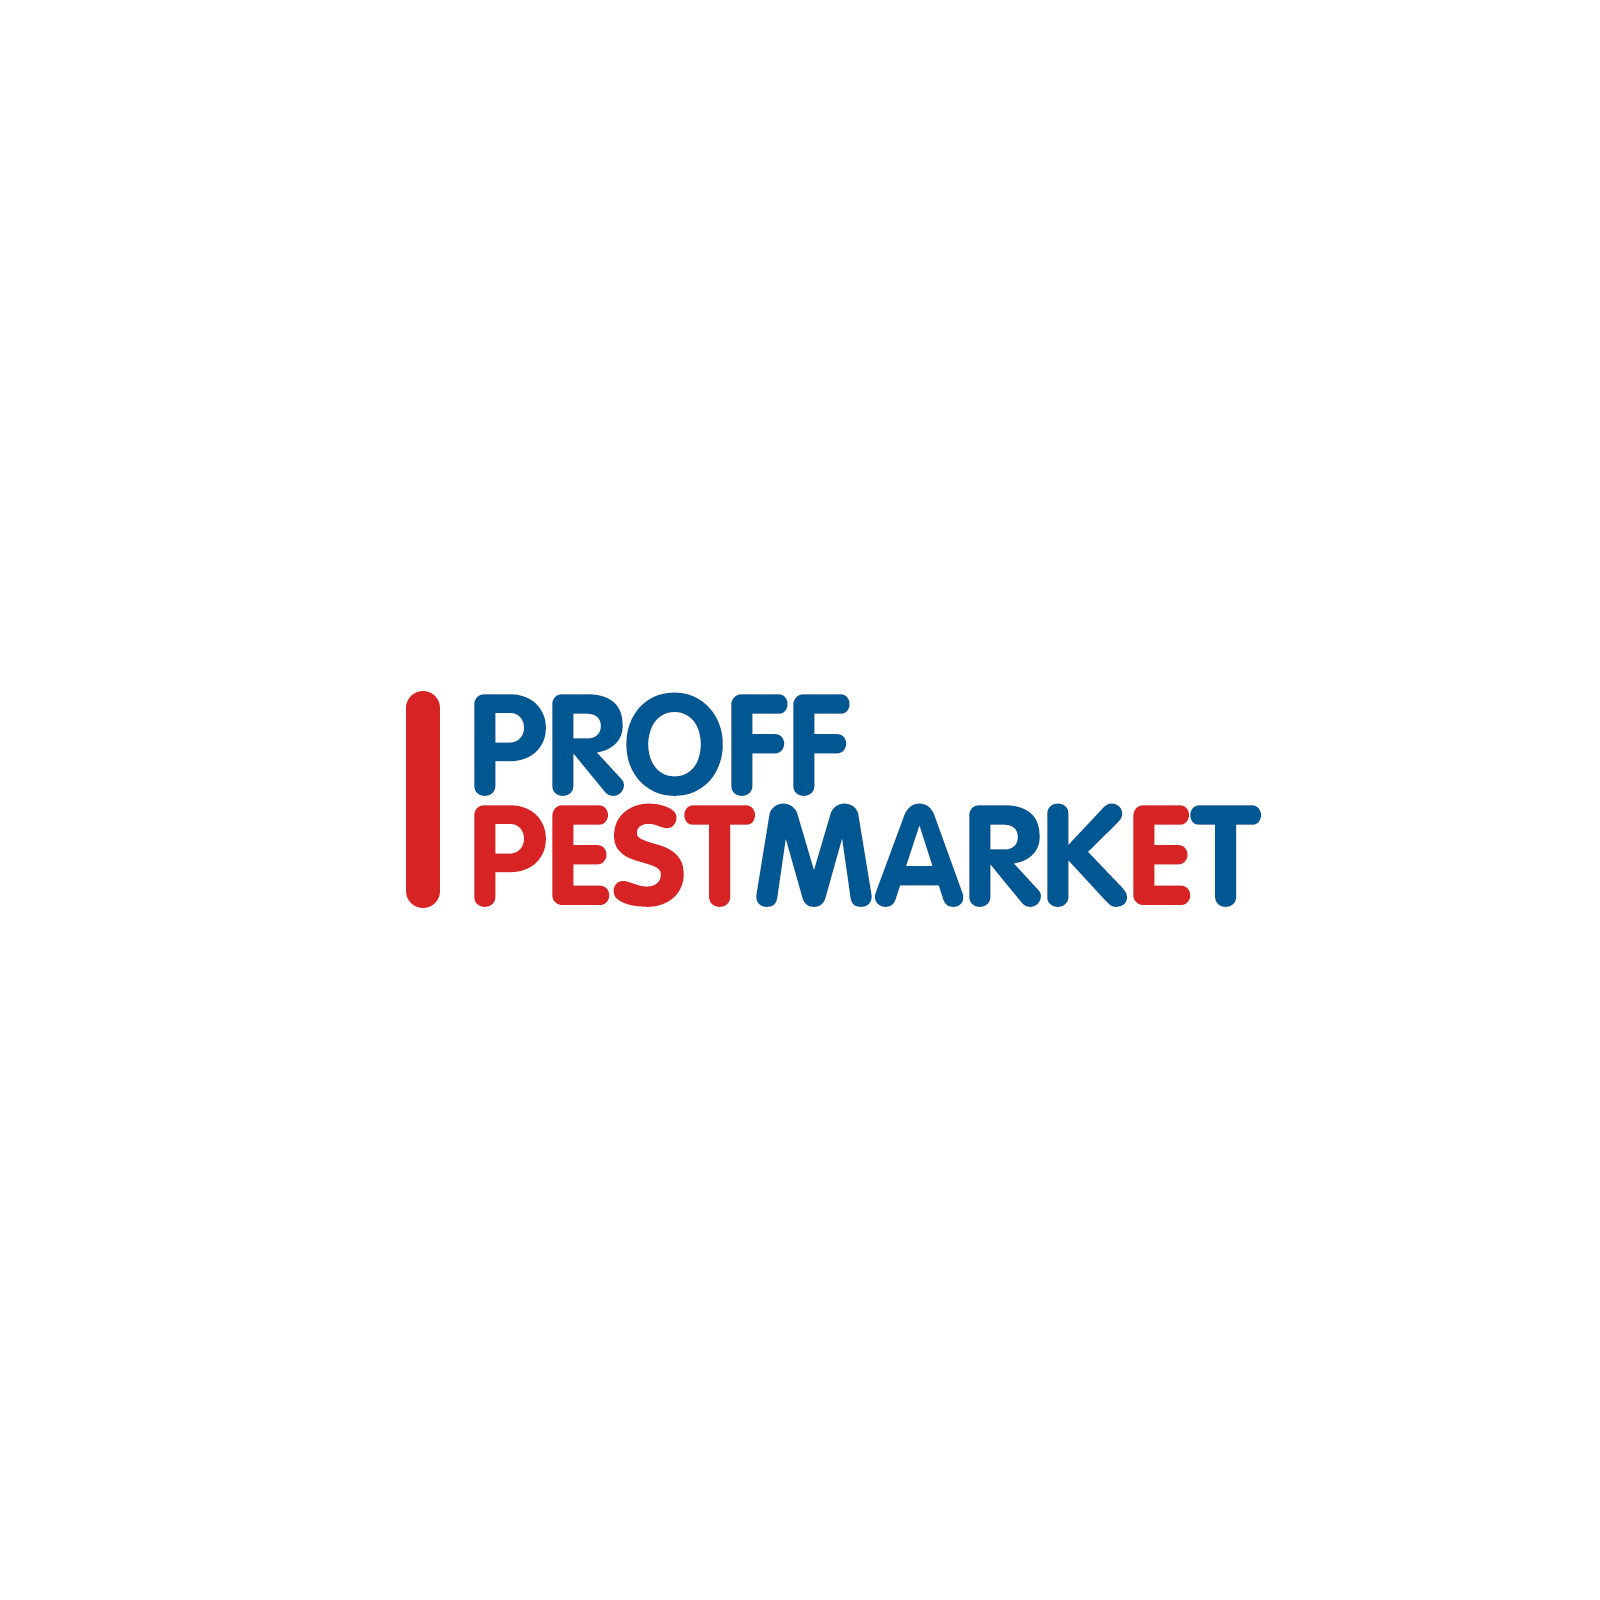 Proffpesmarket